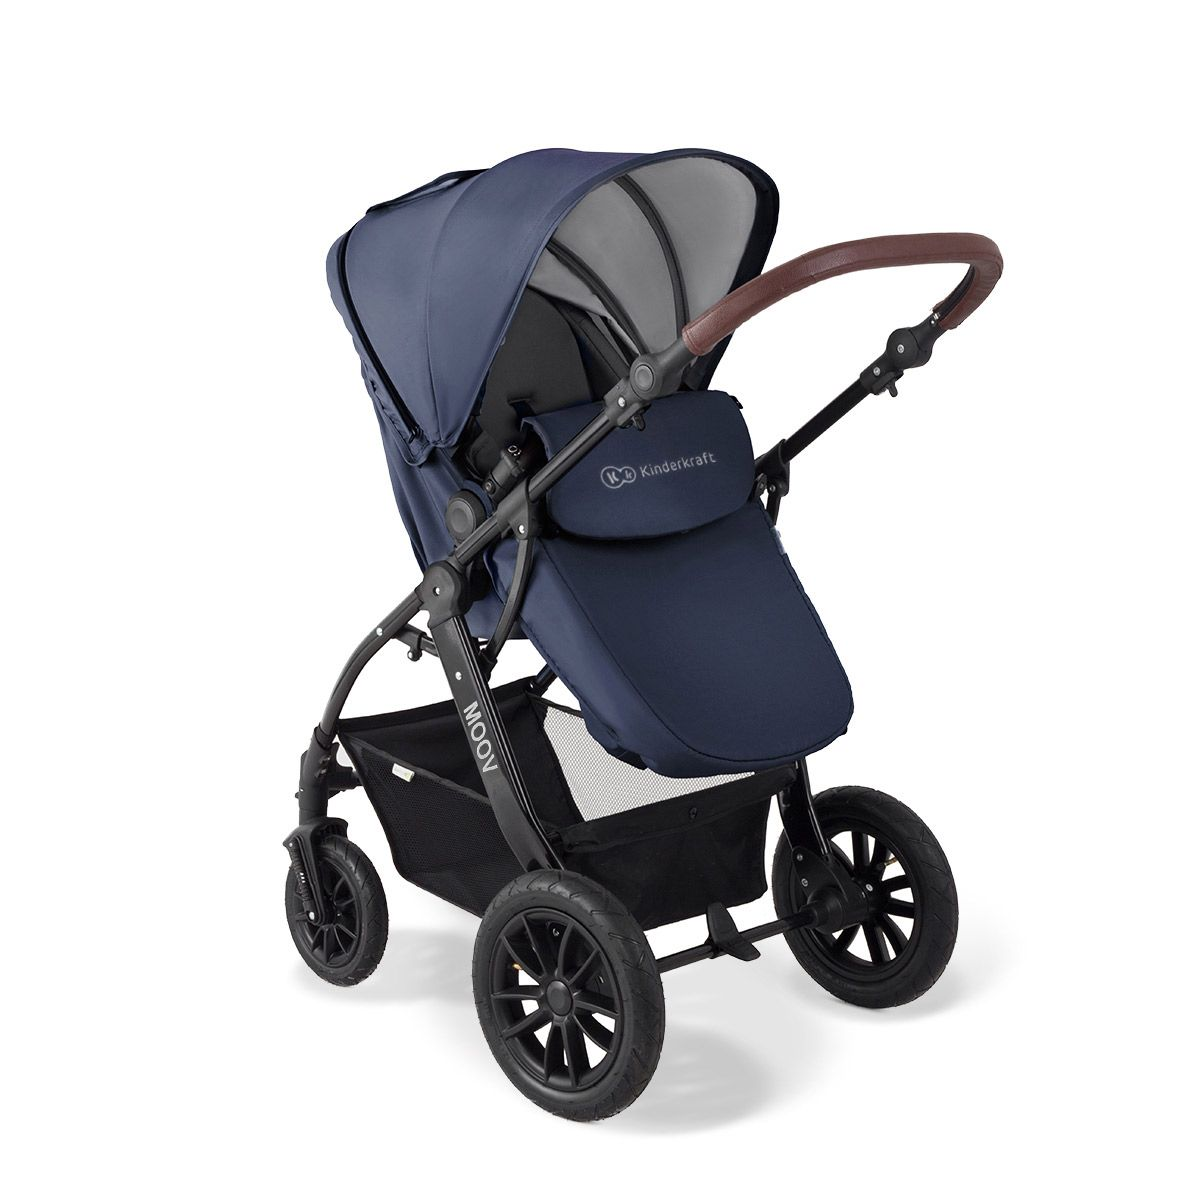 kinderkraft moov multi kinderwagen kombikinderwagen 3in1 buggy babyschale neu ebay. Black Bedroom Furniture Sets. Home Design Ideas